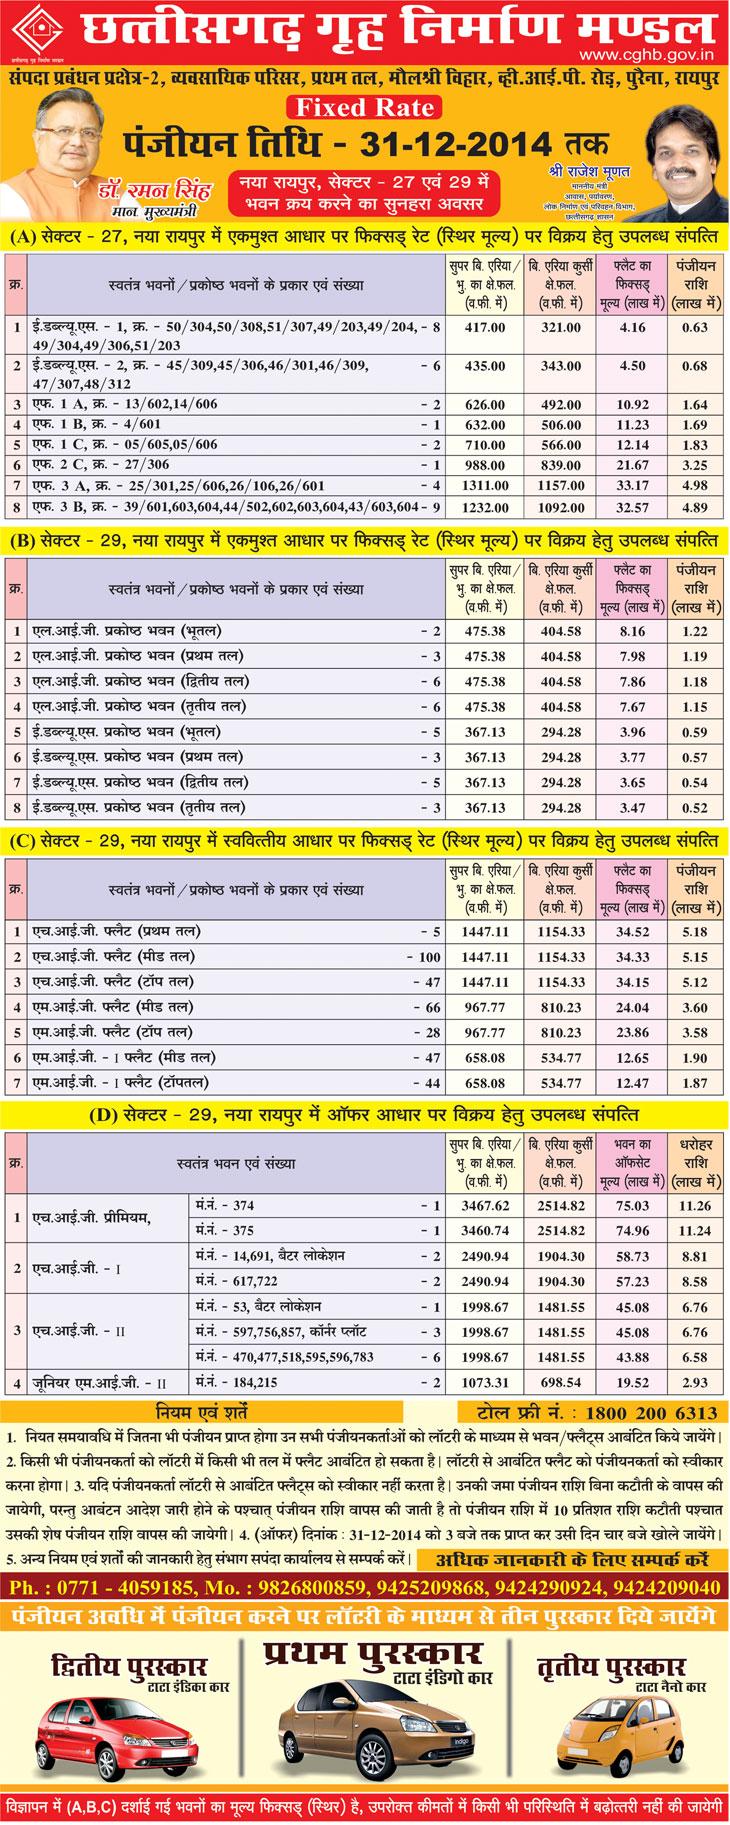 Chhattisgarh Housing Board New Housing Scheme Naya Raipur Sector 29 & 27